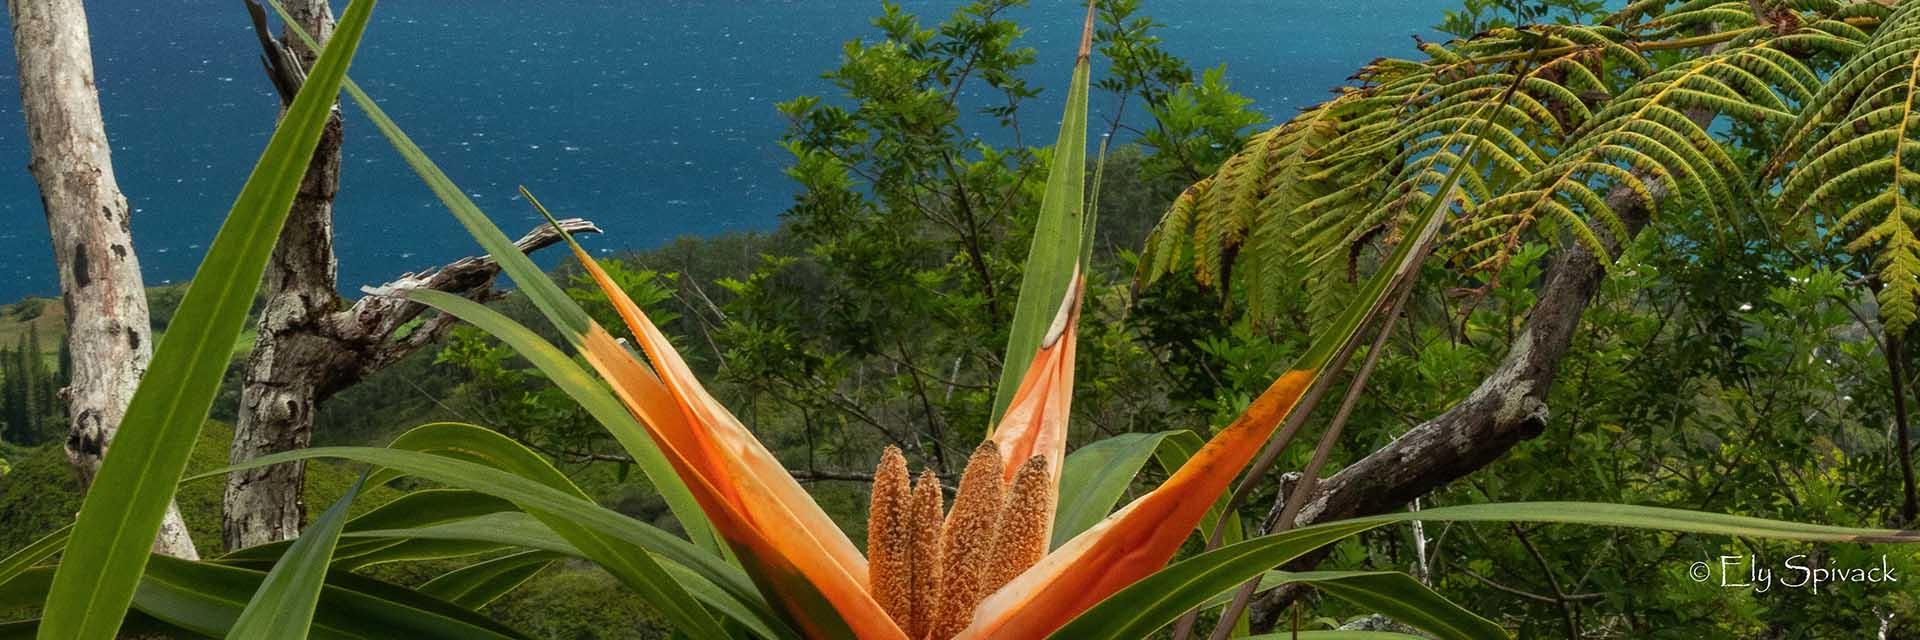 orange flower with ocean in background